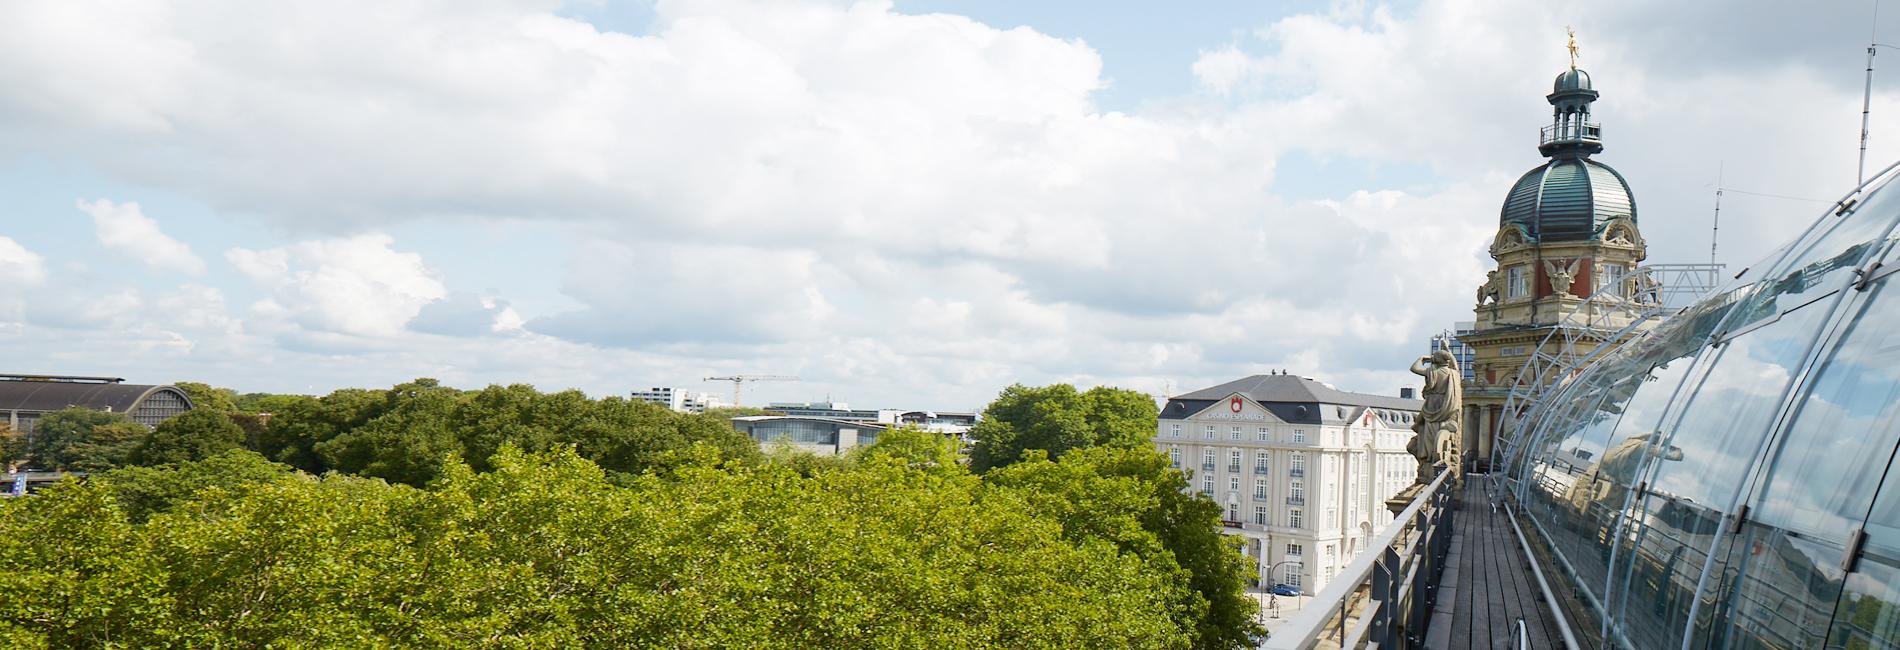 MEDIZINICUM-Stationaer-Klinikum-Stephansplatz